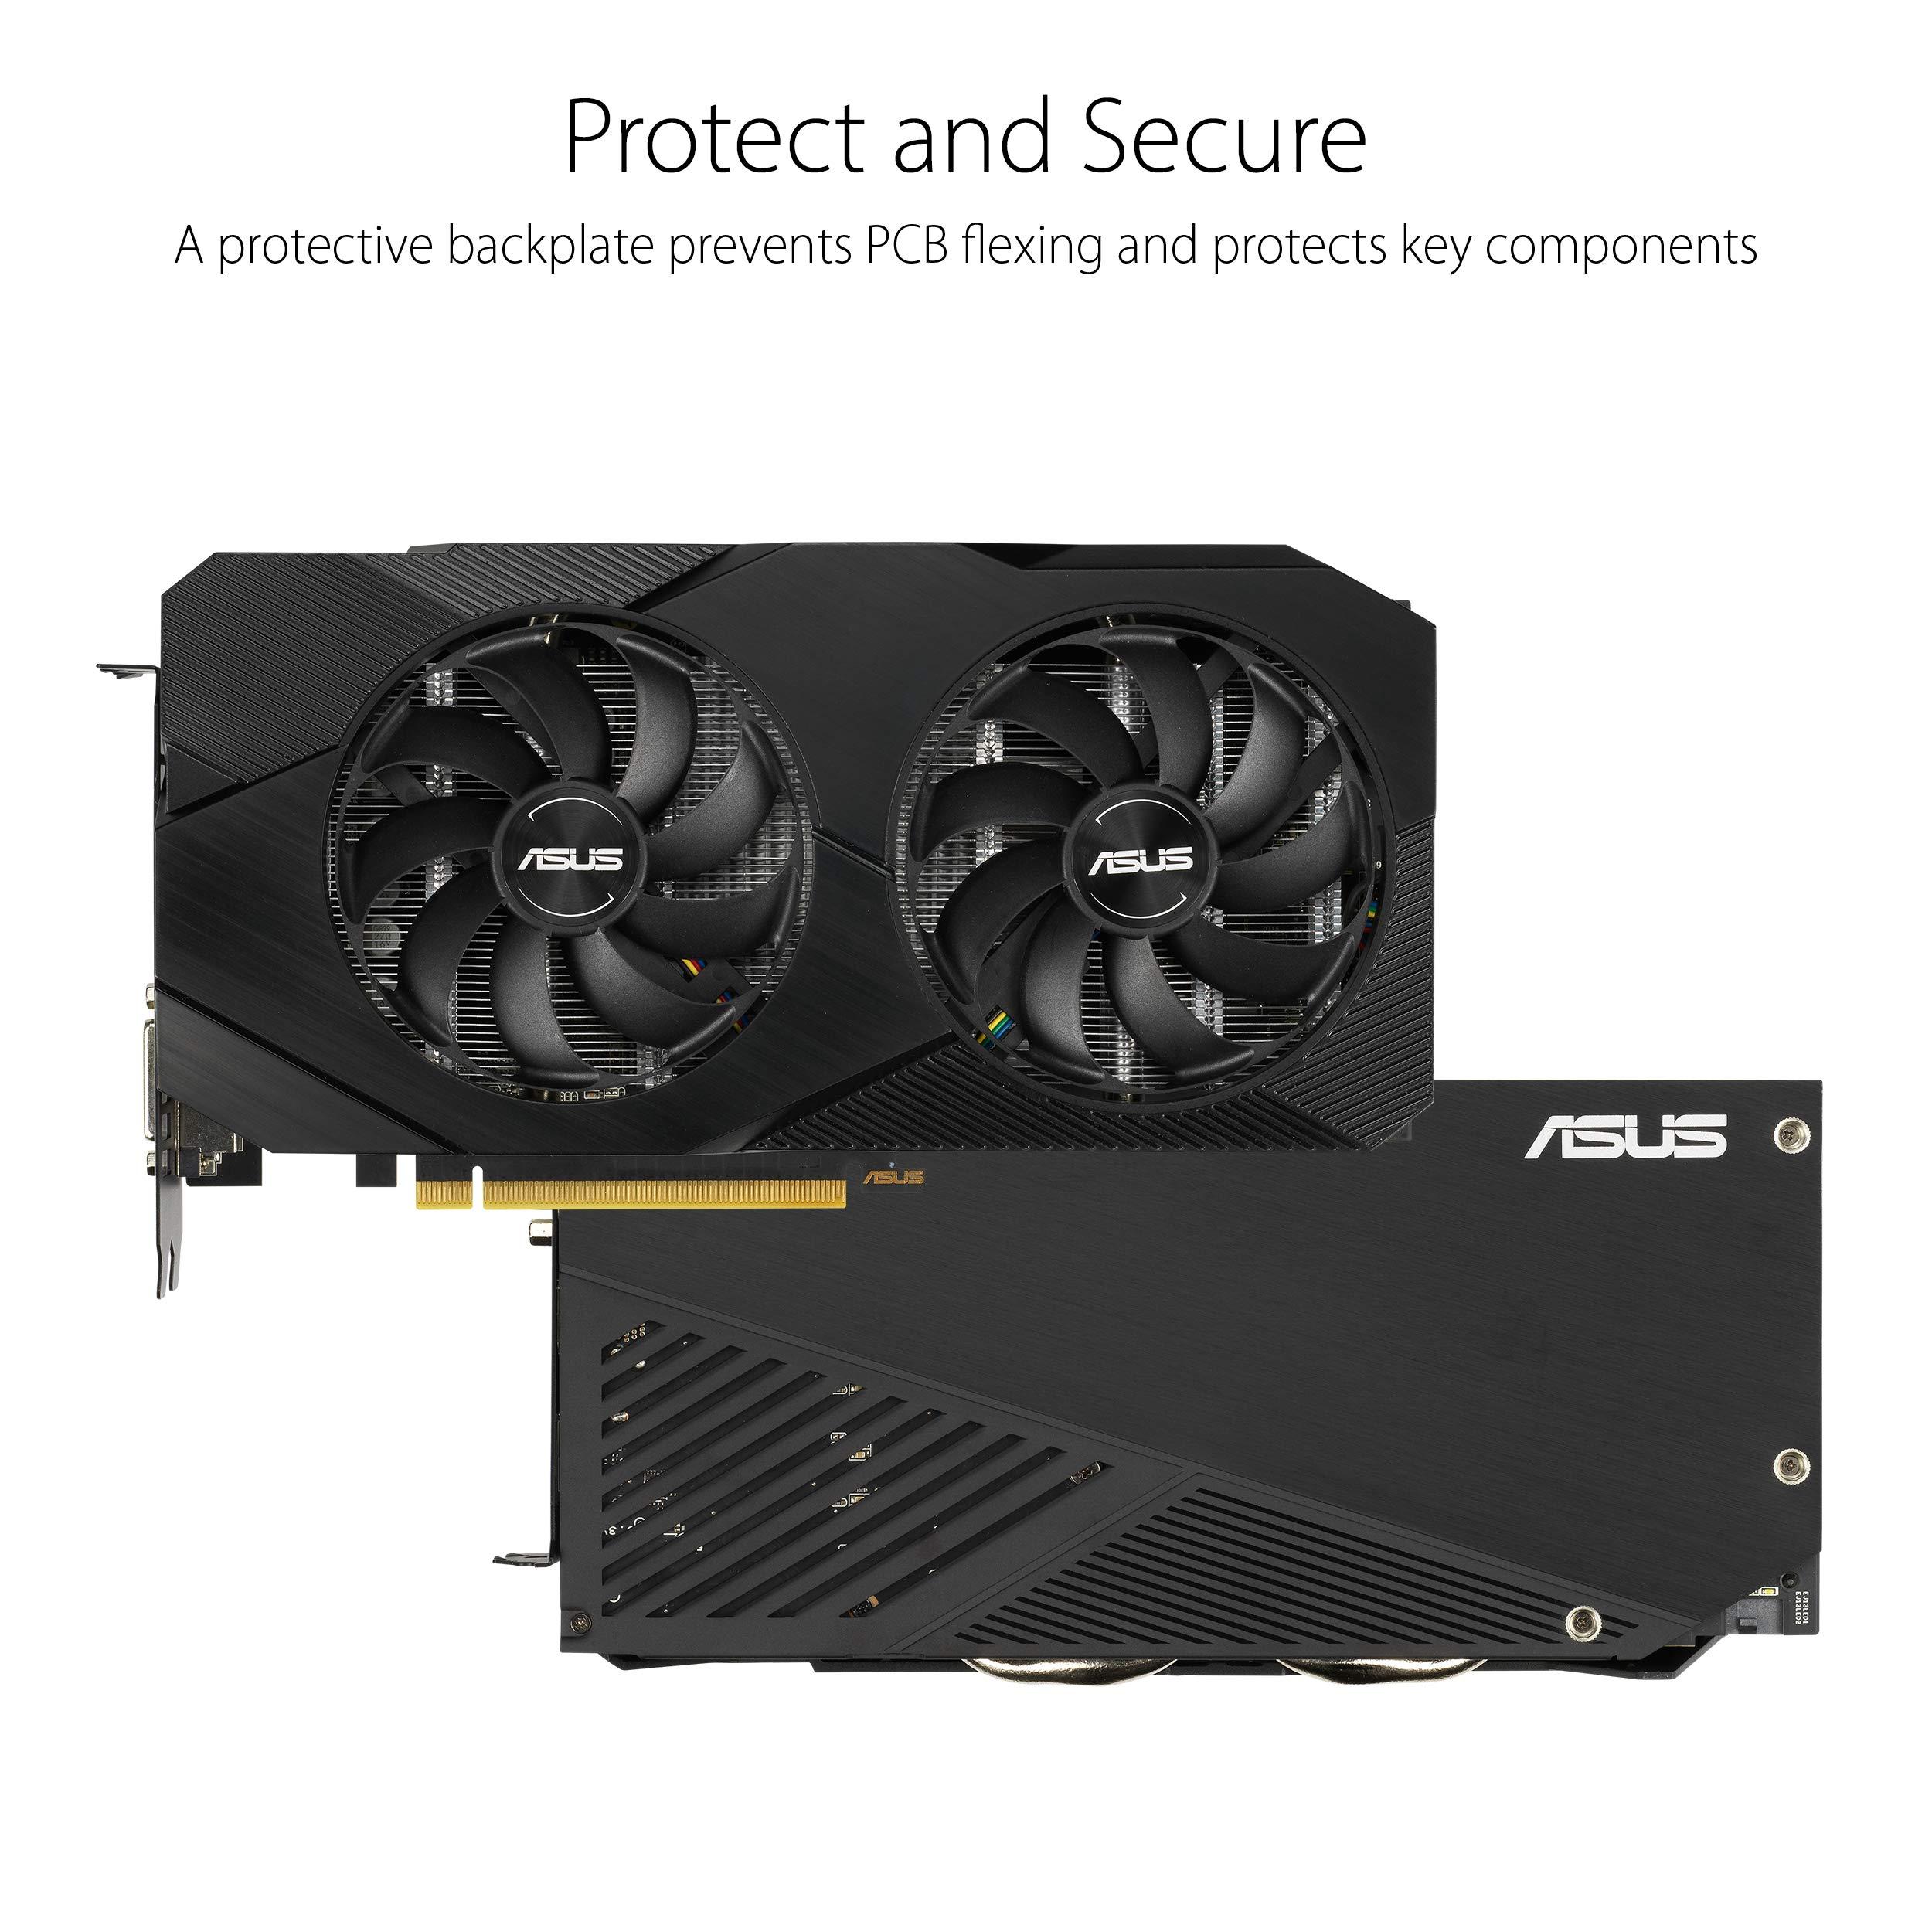 ASUS GeForce RTX 2060 Overclocked 6G GDDR6 Dual-Fan EVO Edition VR Ready HDMI DisplayPort DVI Graphics Card (DUAL-RTX2060-O6G-EVO) DUAL RTX 2060 RTX 2060